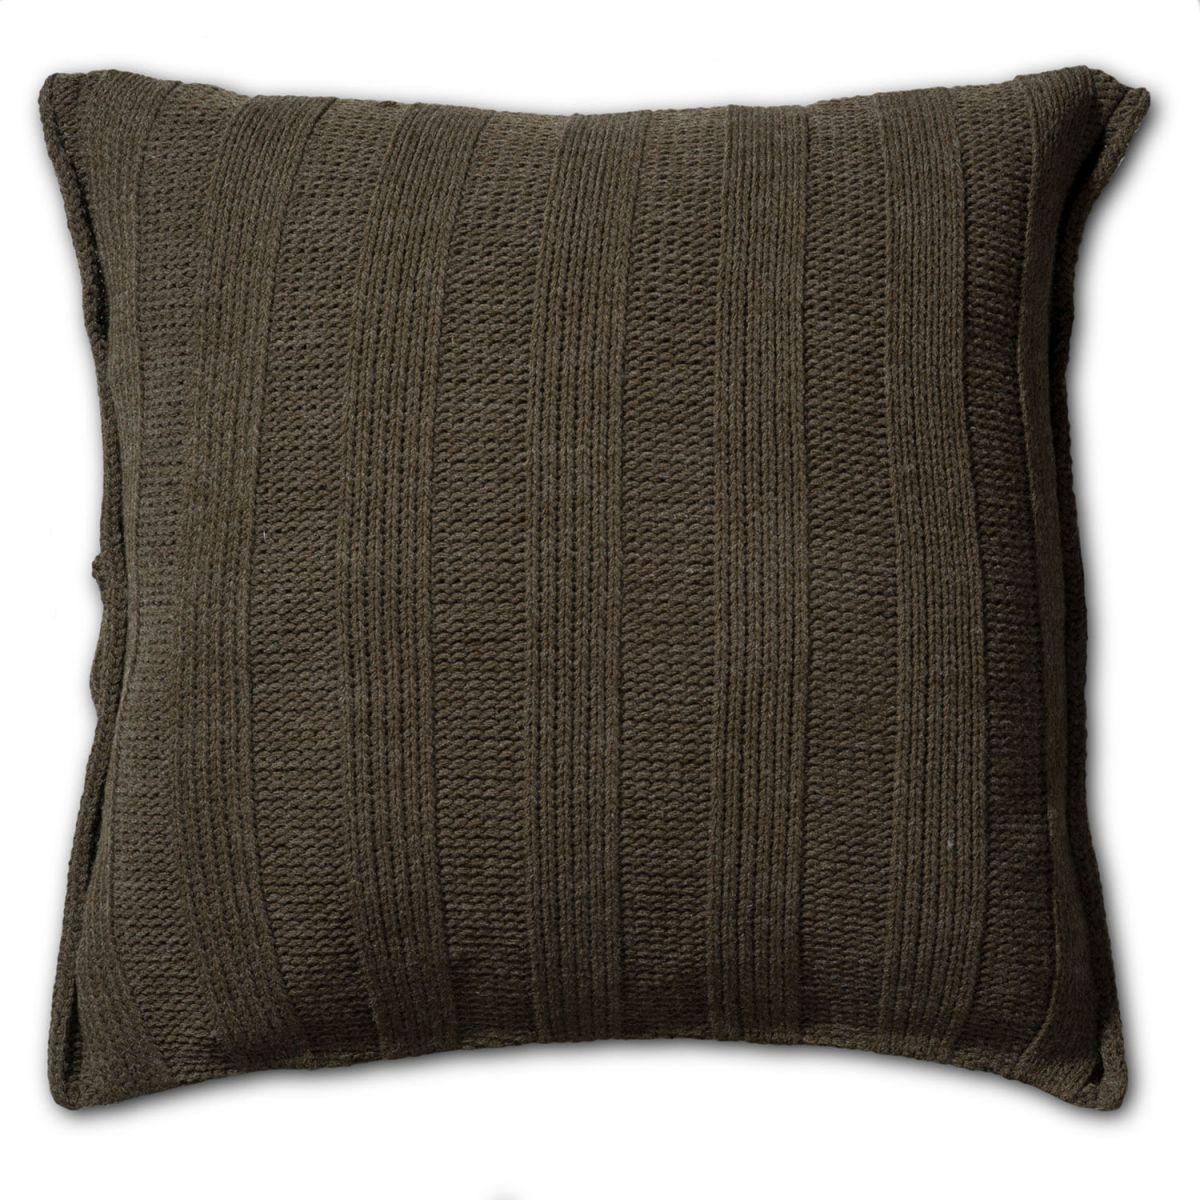 knit factory 1121214 kussen 50x50 6x6 rib groen 2